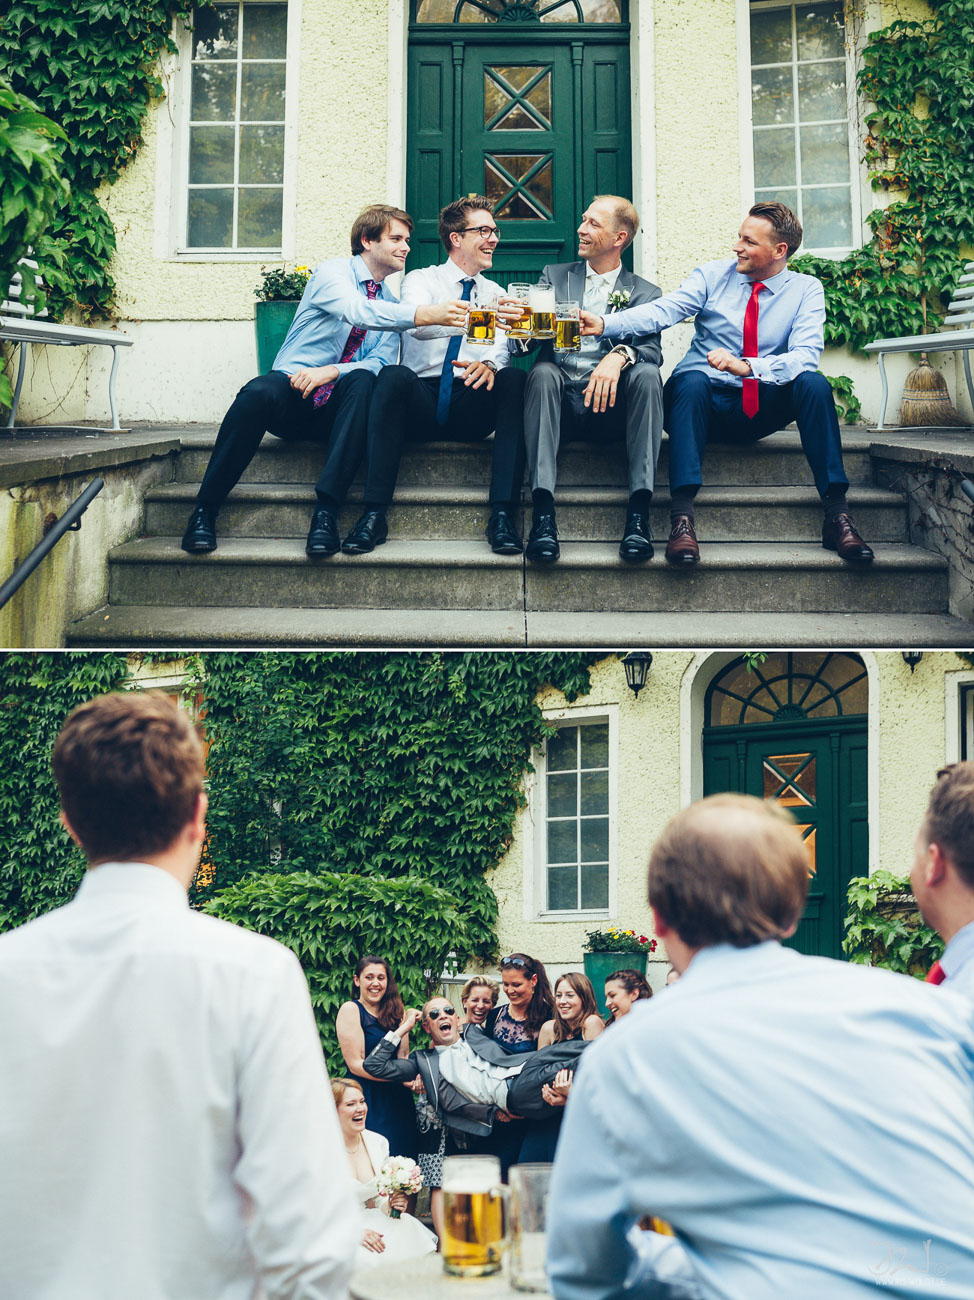 0045_Hochzeitsfotograf_Potsdam_Gut_Schloss_Golm_IrisWoldt46